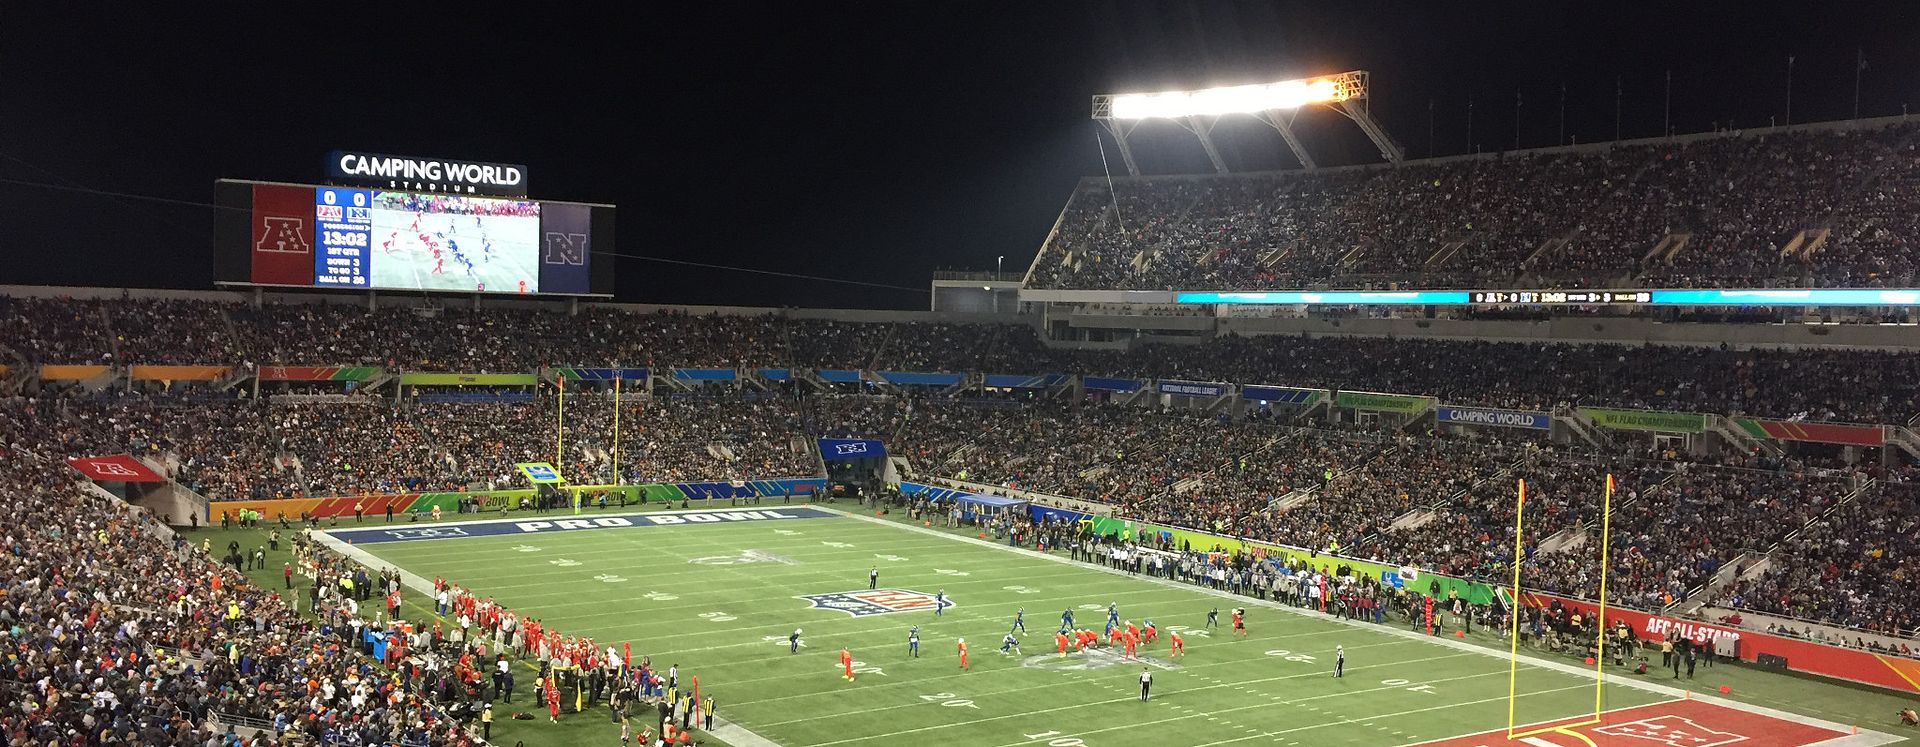 Pro Bowl football game at Camping World stadium